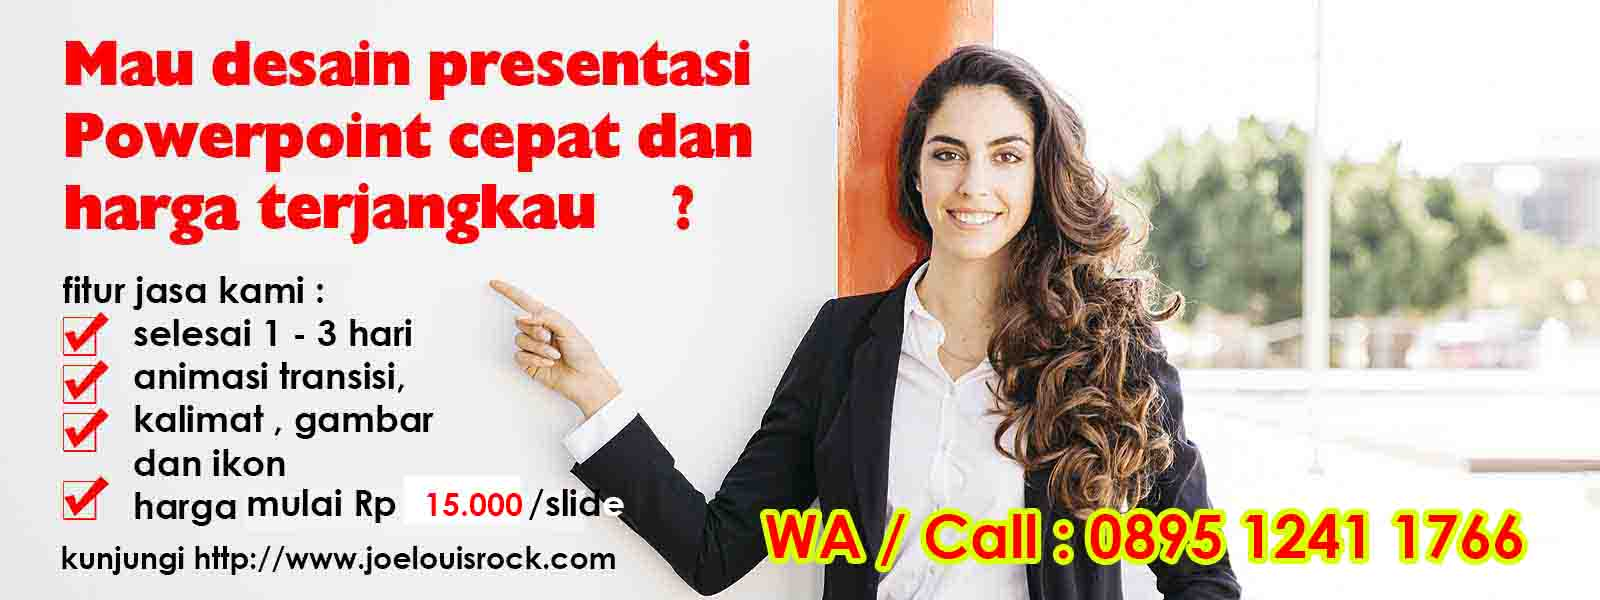 jasa desain powerpoint murah depok - joelouisrock - com